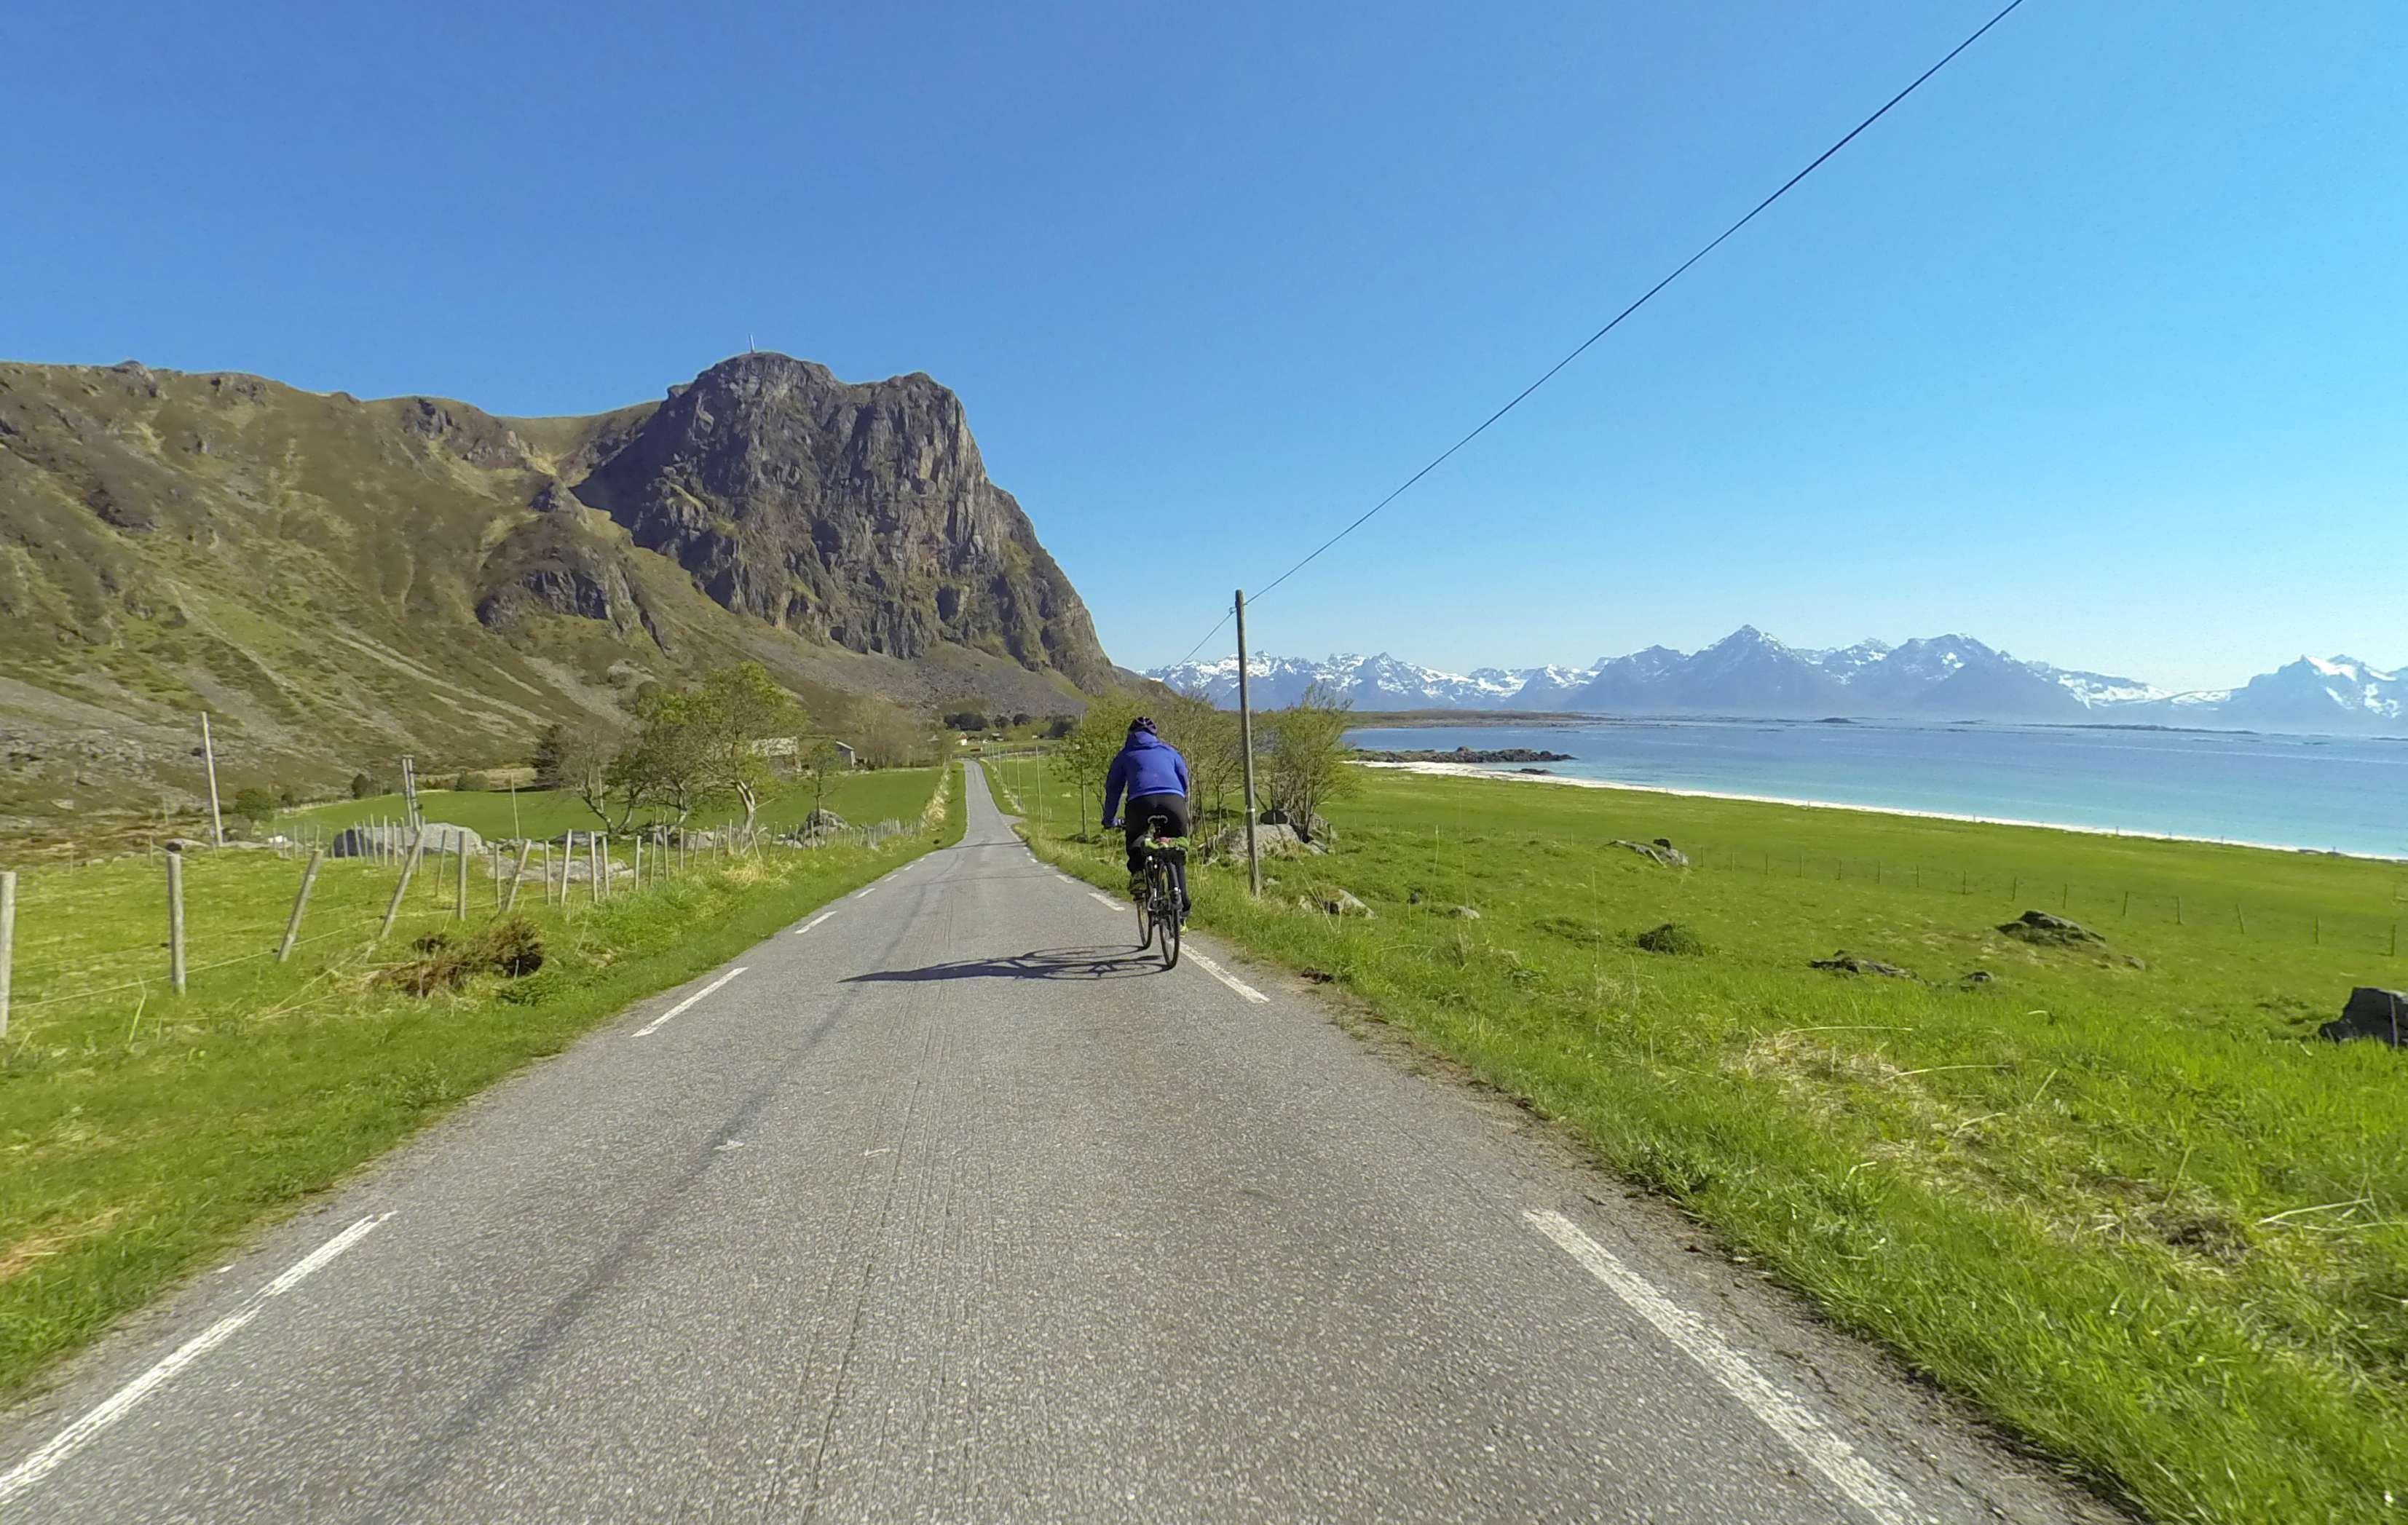 Bike rental - Discover vesterålen by bike